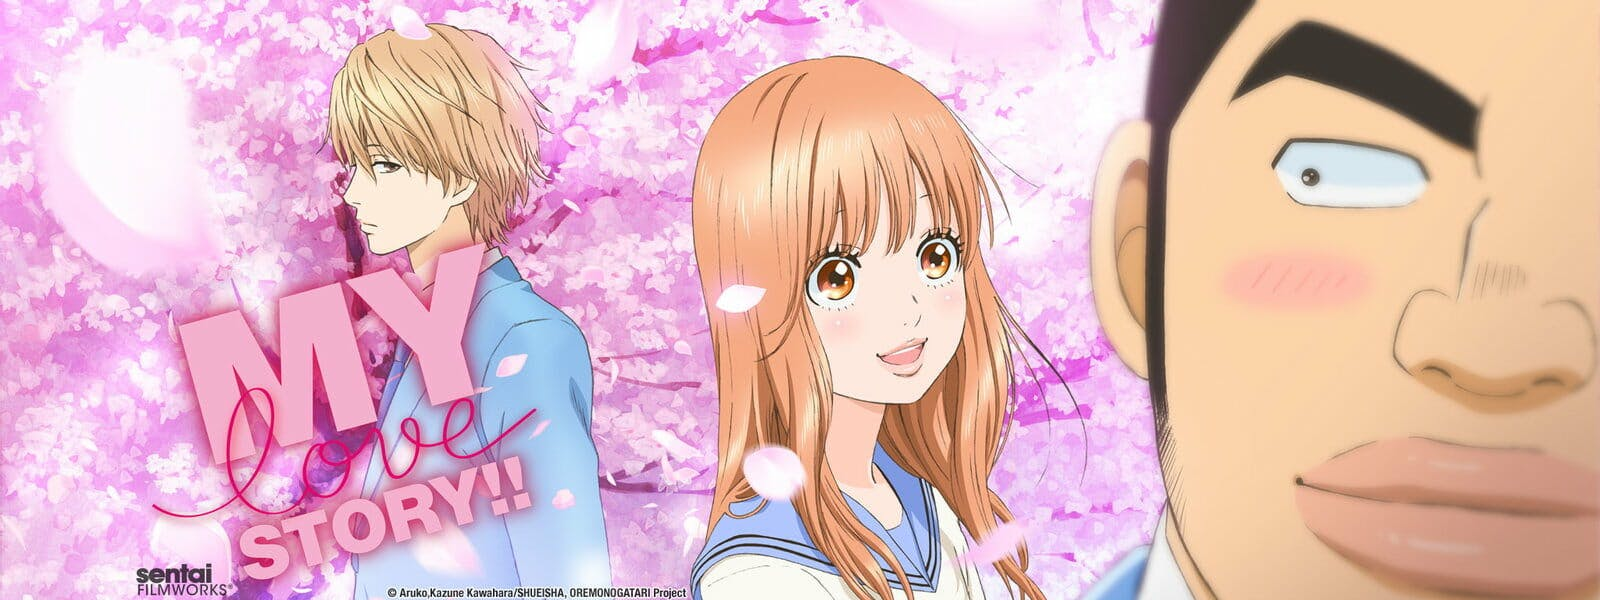 romance anime my love story